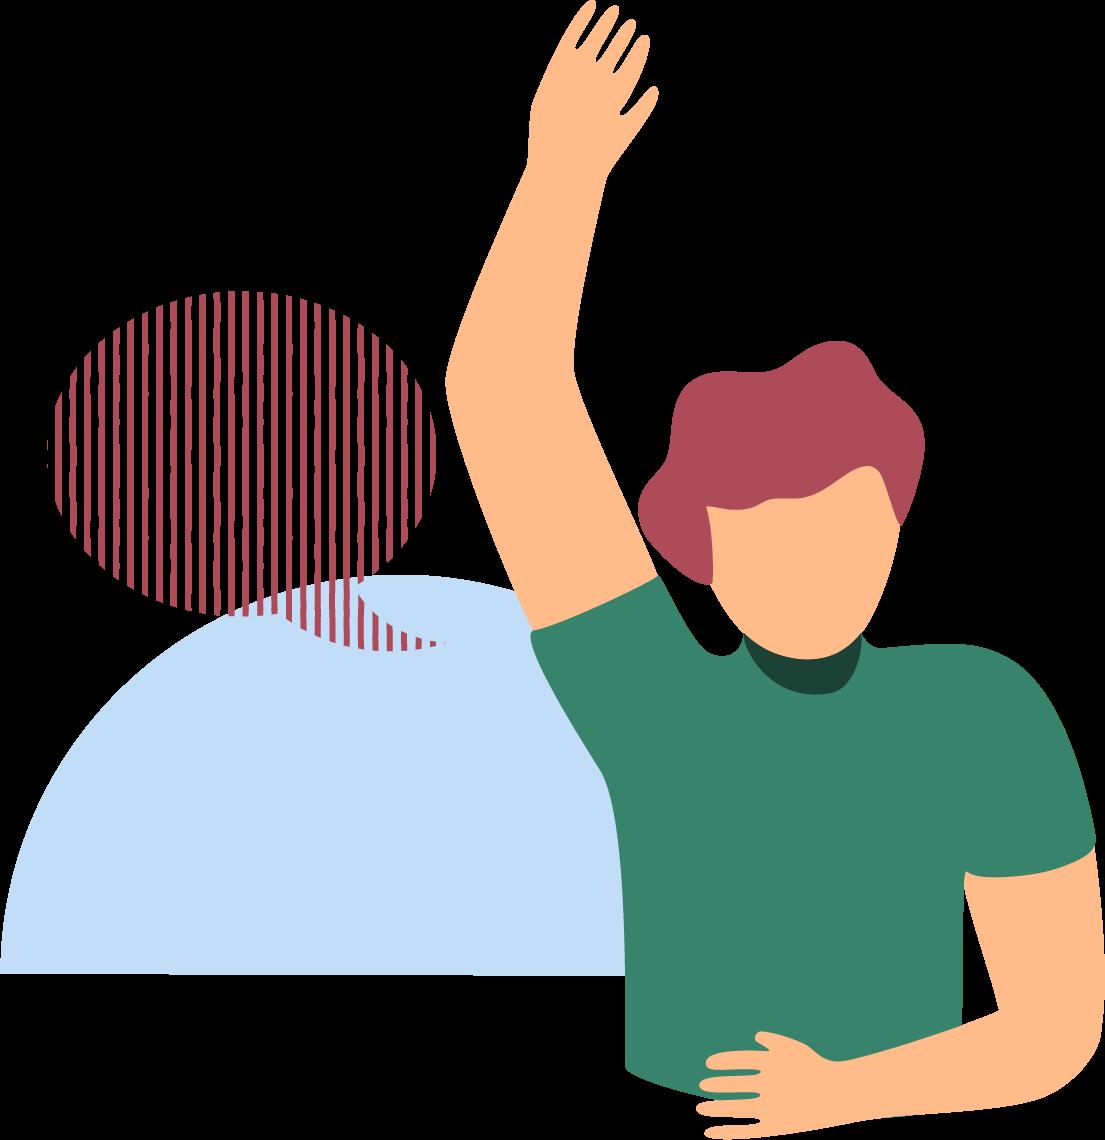 raise hand icon